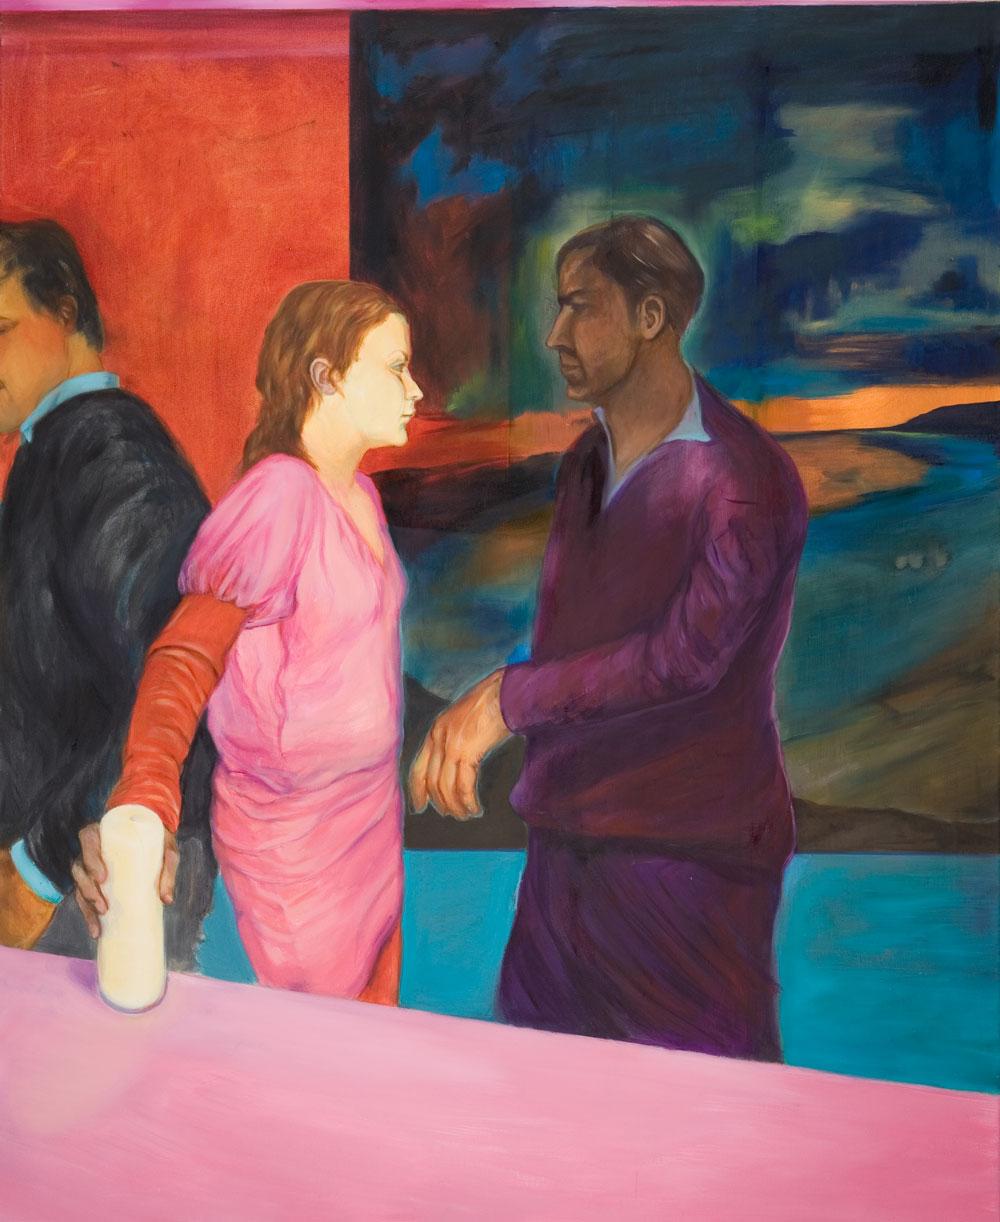 Dreiecksbeziehung, Frau im rosa Kleid, fleischige Hand